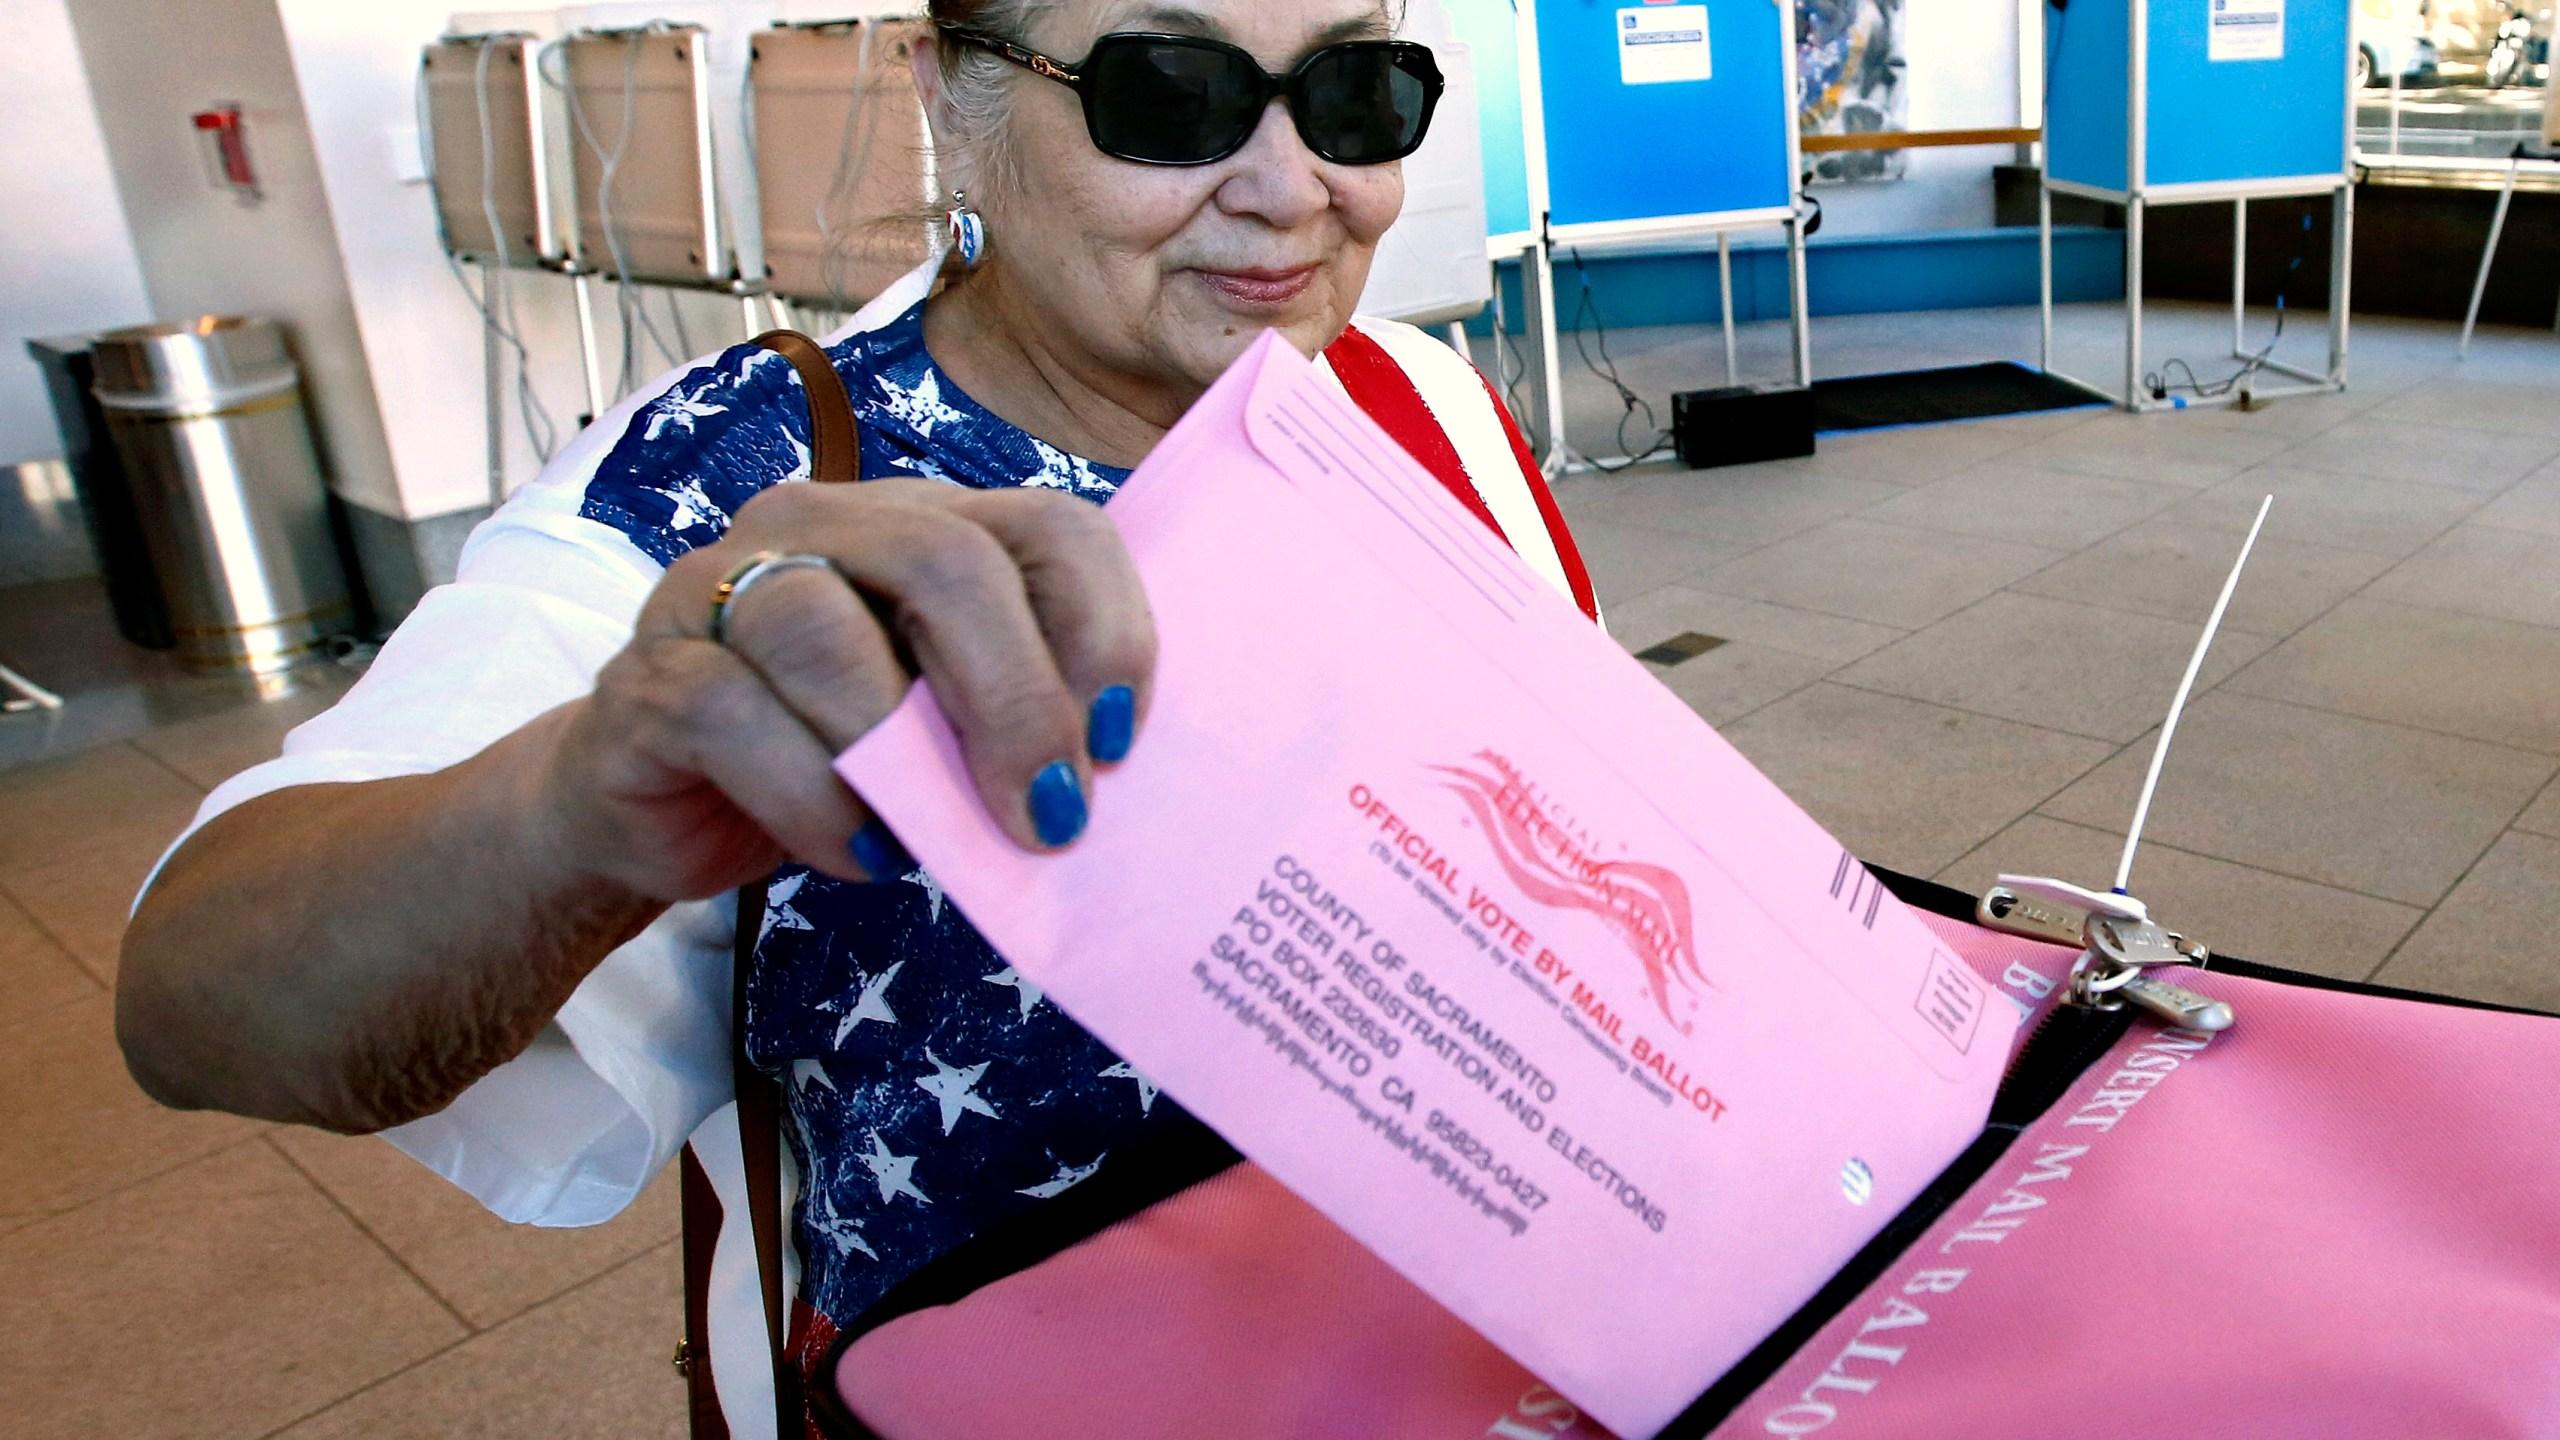 Election_2018_Voting_California_59118-159532.jpg90785668